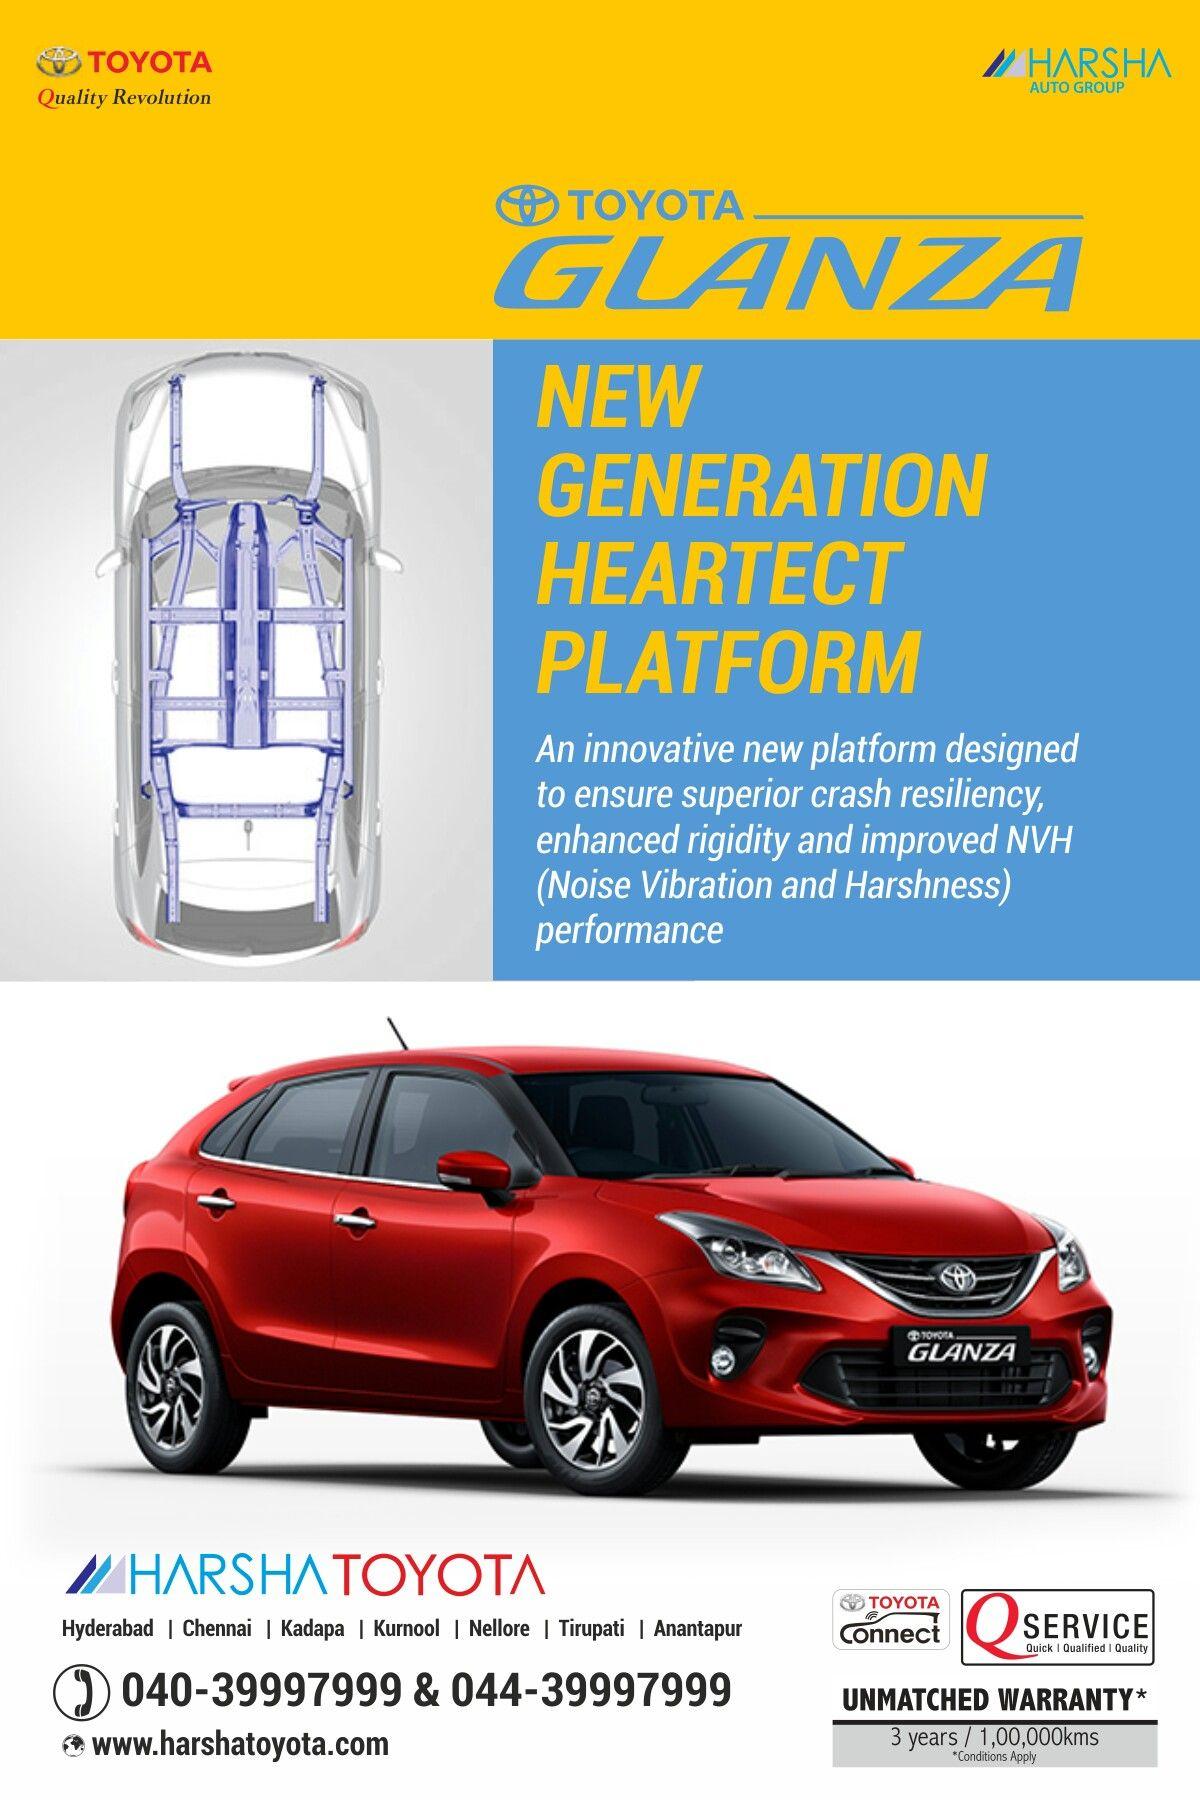 New Generation Heartect Platform An Innovative New